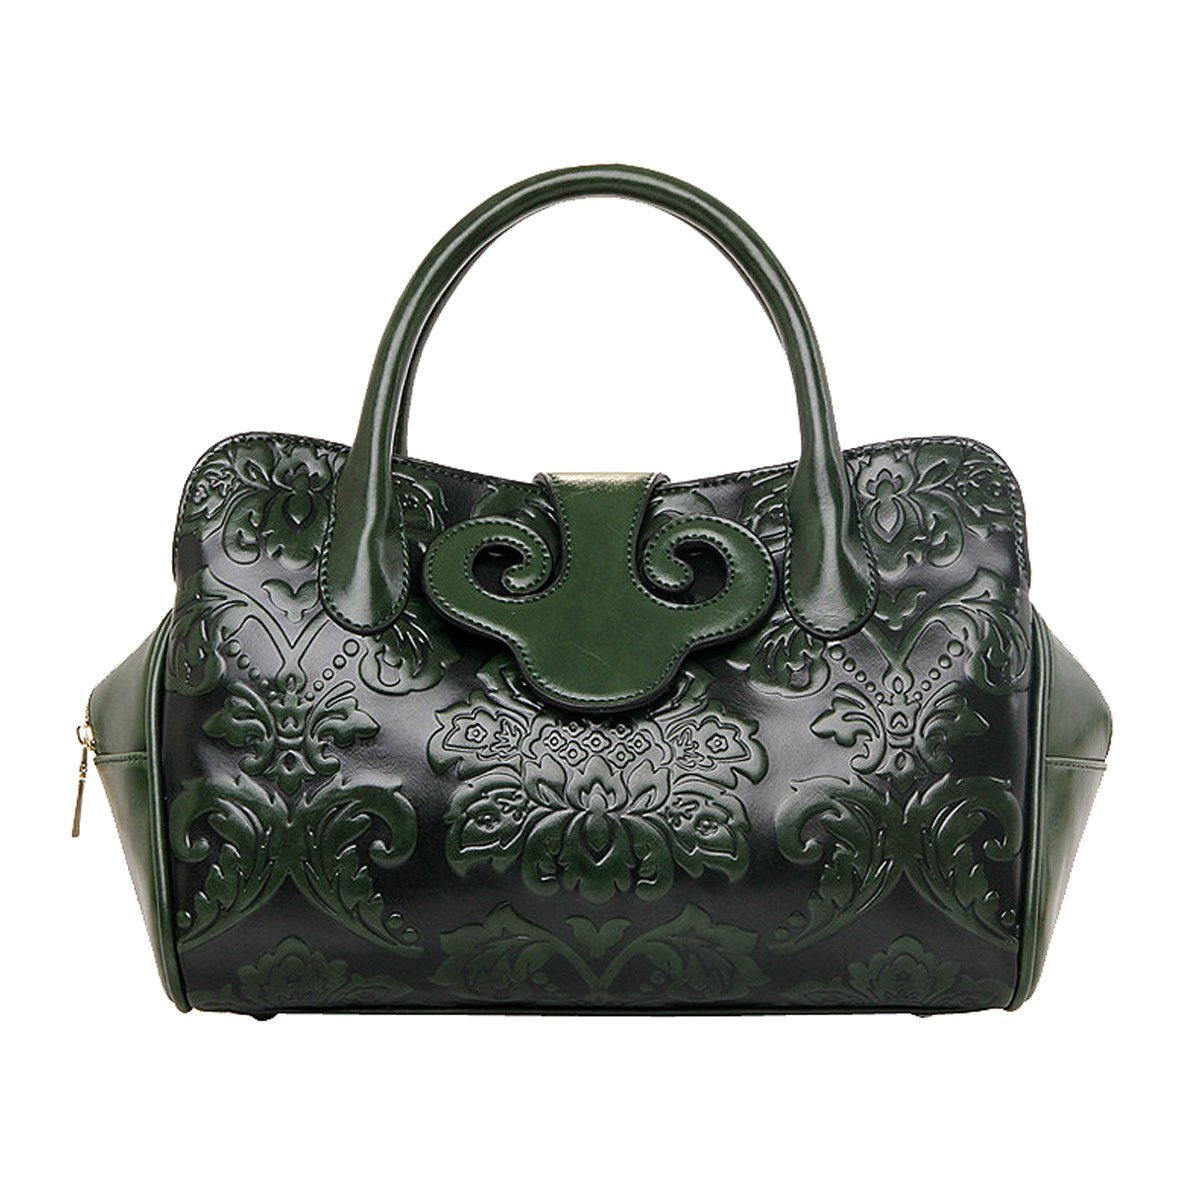 Women PU Leather Embossing Classic Top-handle Handbag Messenger Bag Shoulder Bag Chinese Style (Green)